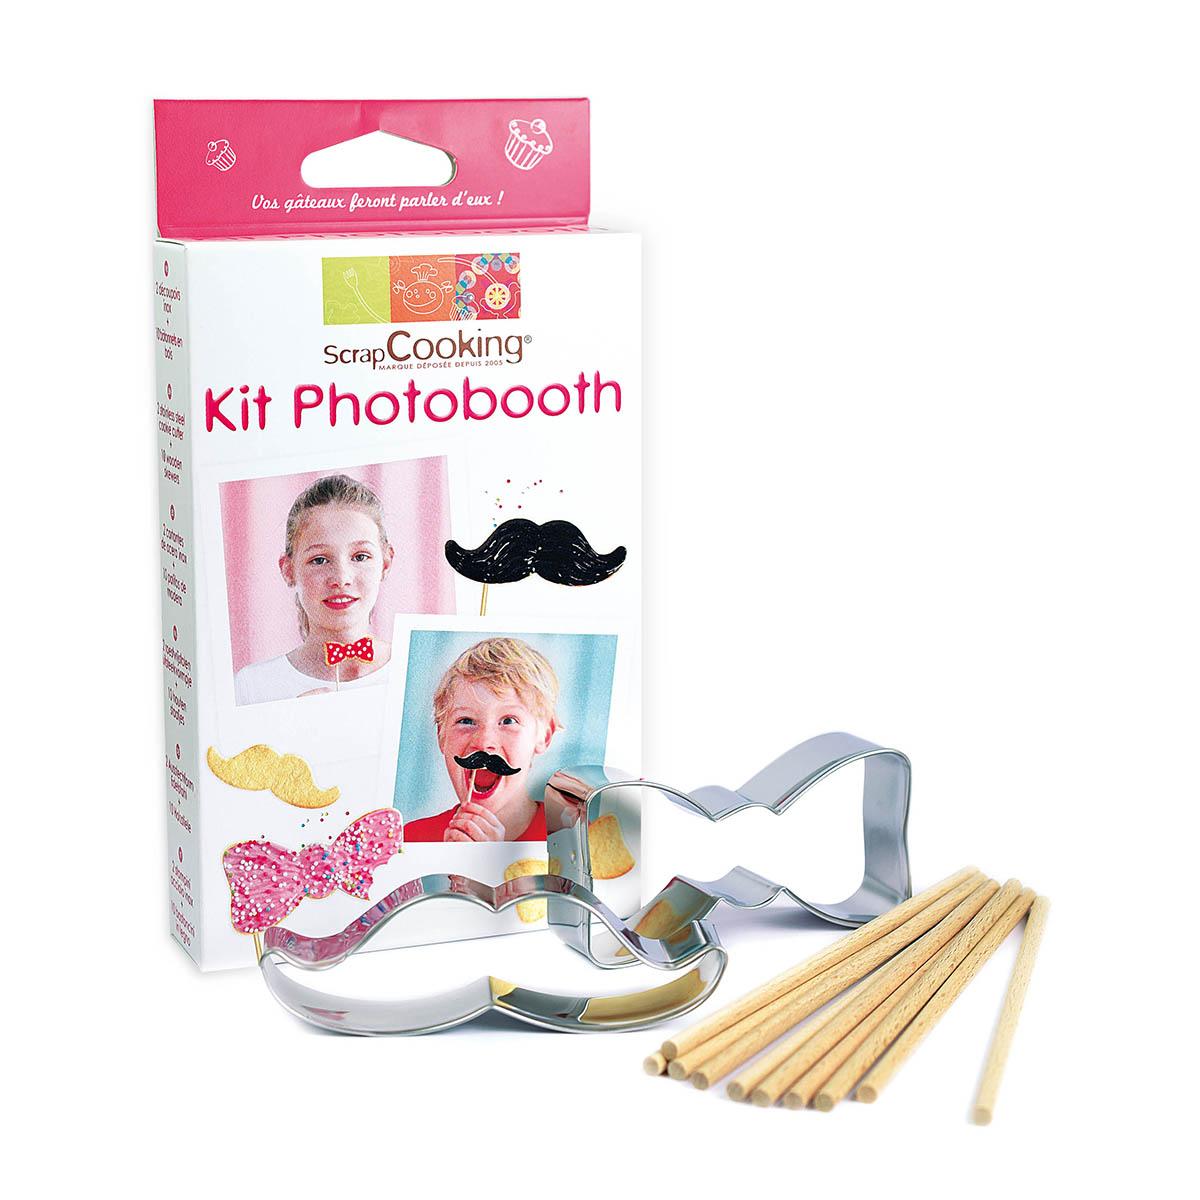 Image du produit Kit Photobooth - Scrapcooking